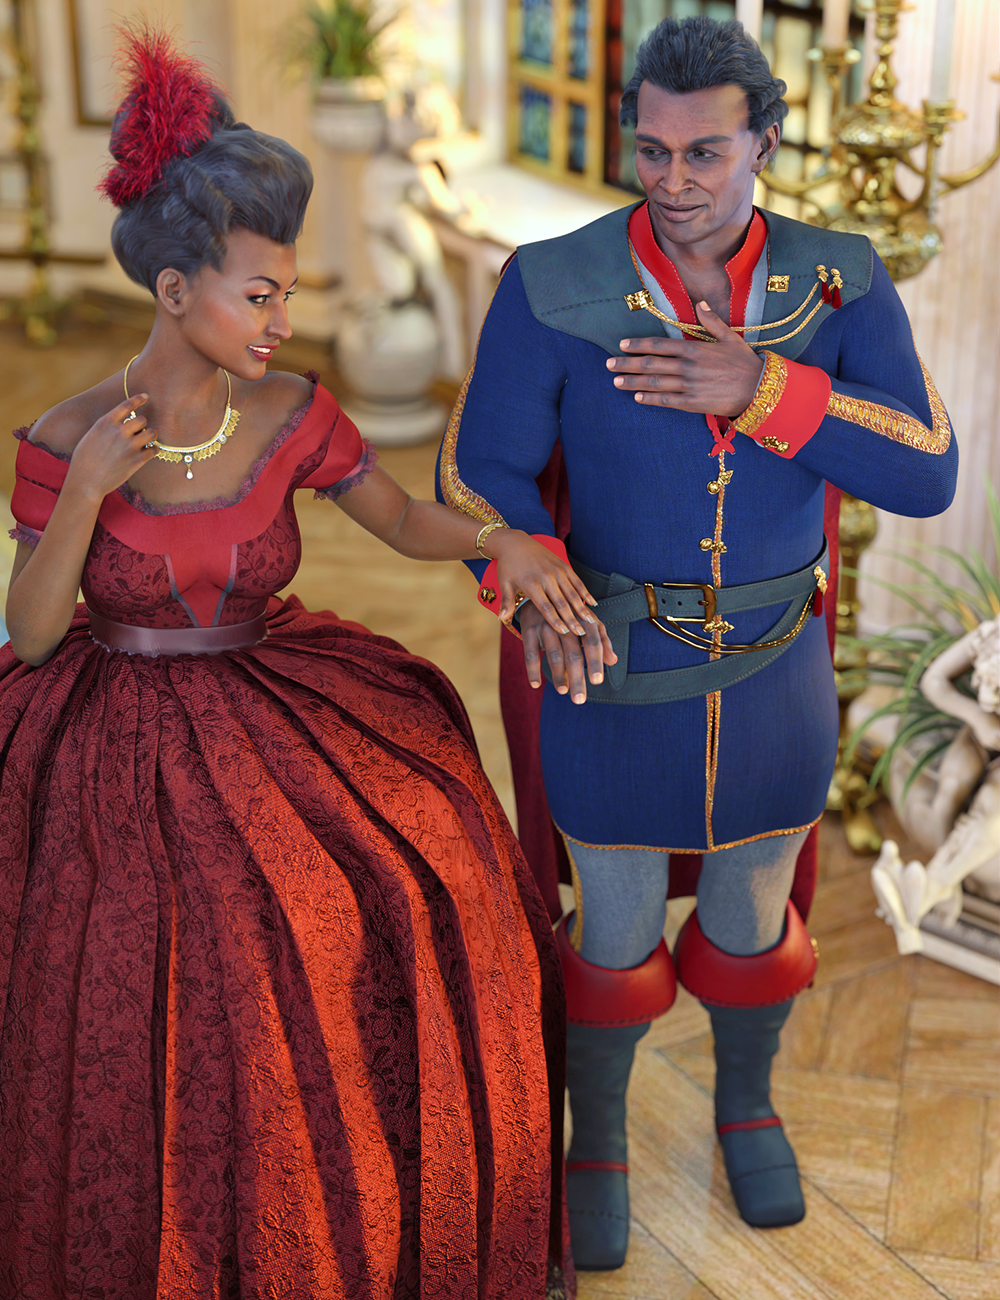 dForce Charming Ever After Outfit for Genesis 8.1 Males by: Barbara BrundonUmblefuglyAnna Benjamin, 3D Models by Daz 3D